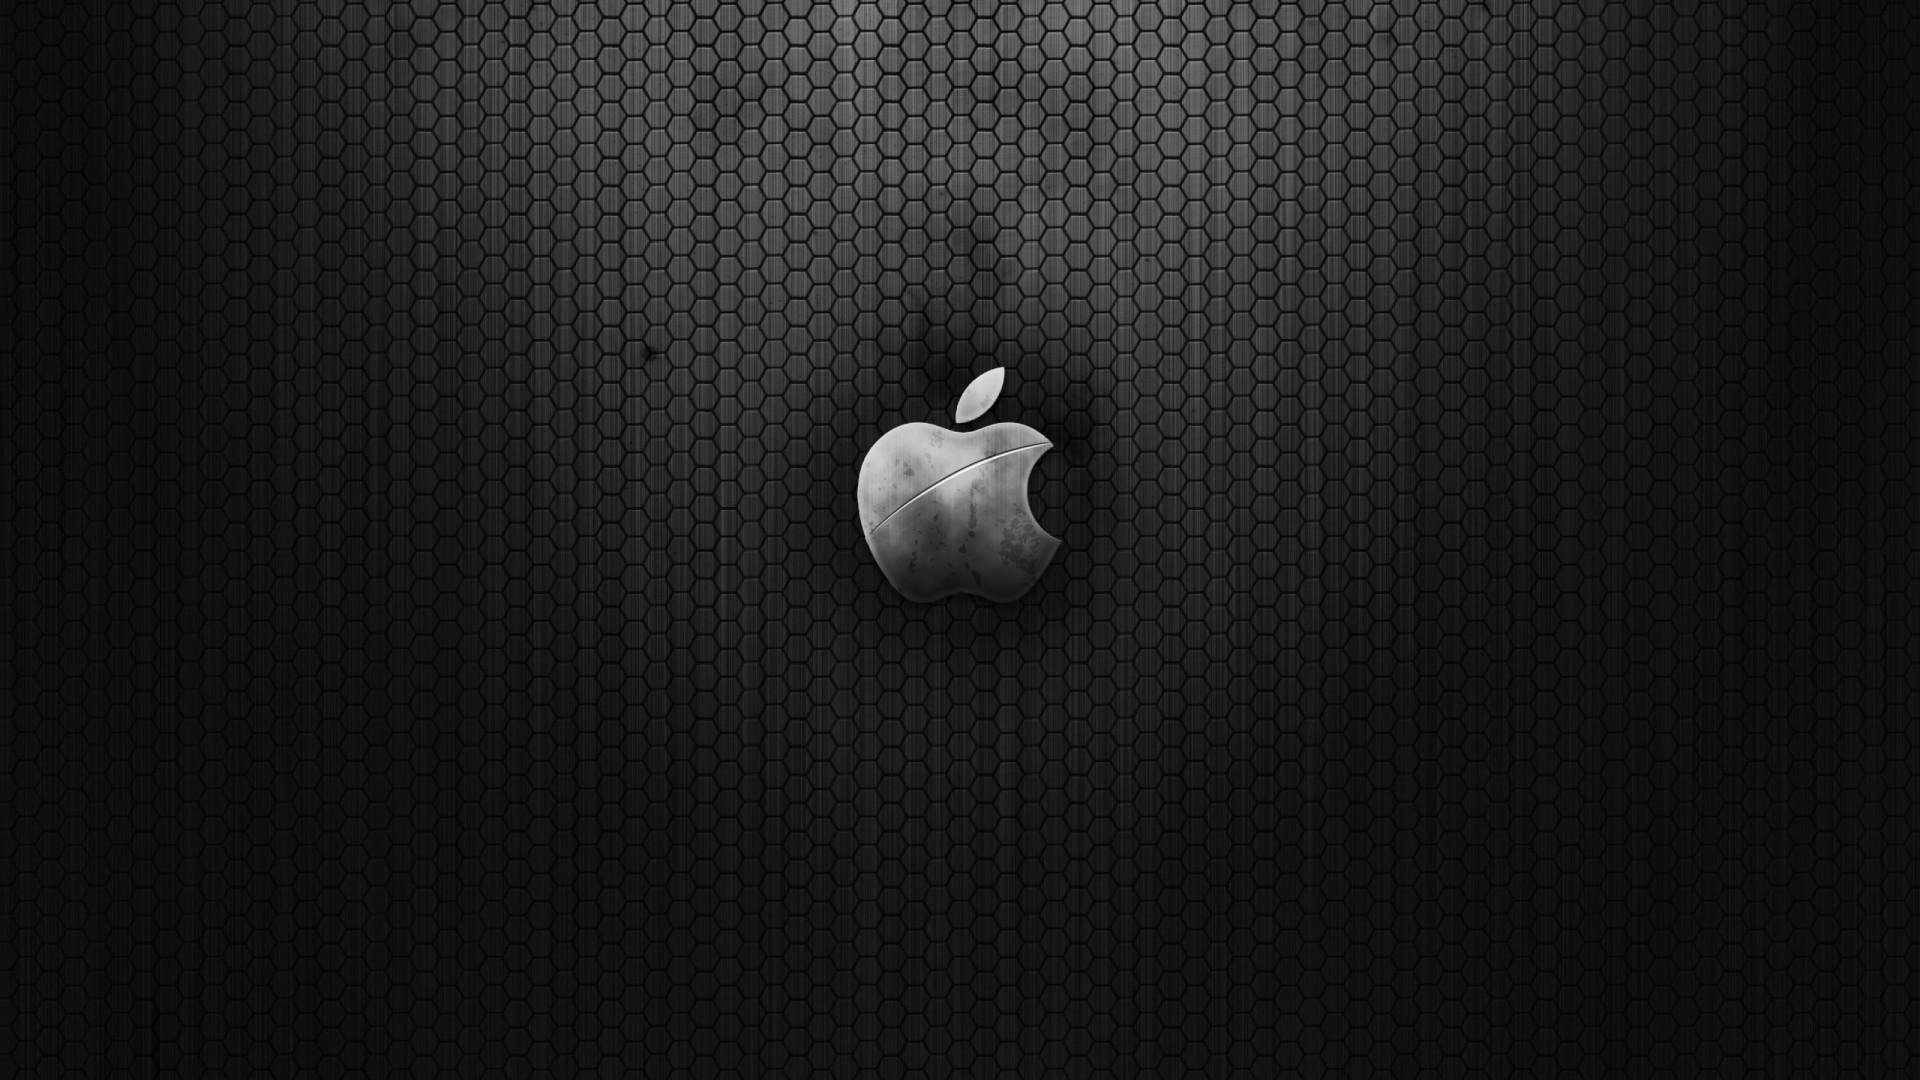 … apple metal carbon fiber 1920 x 1080 hdtv 1080p wallpaper …